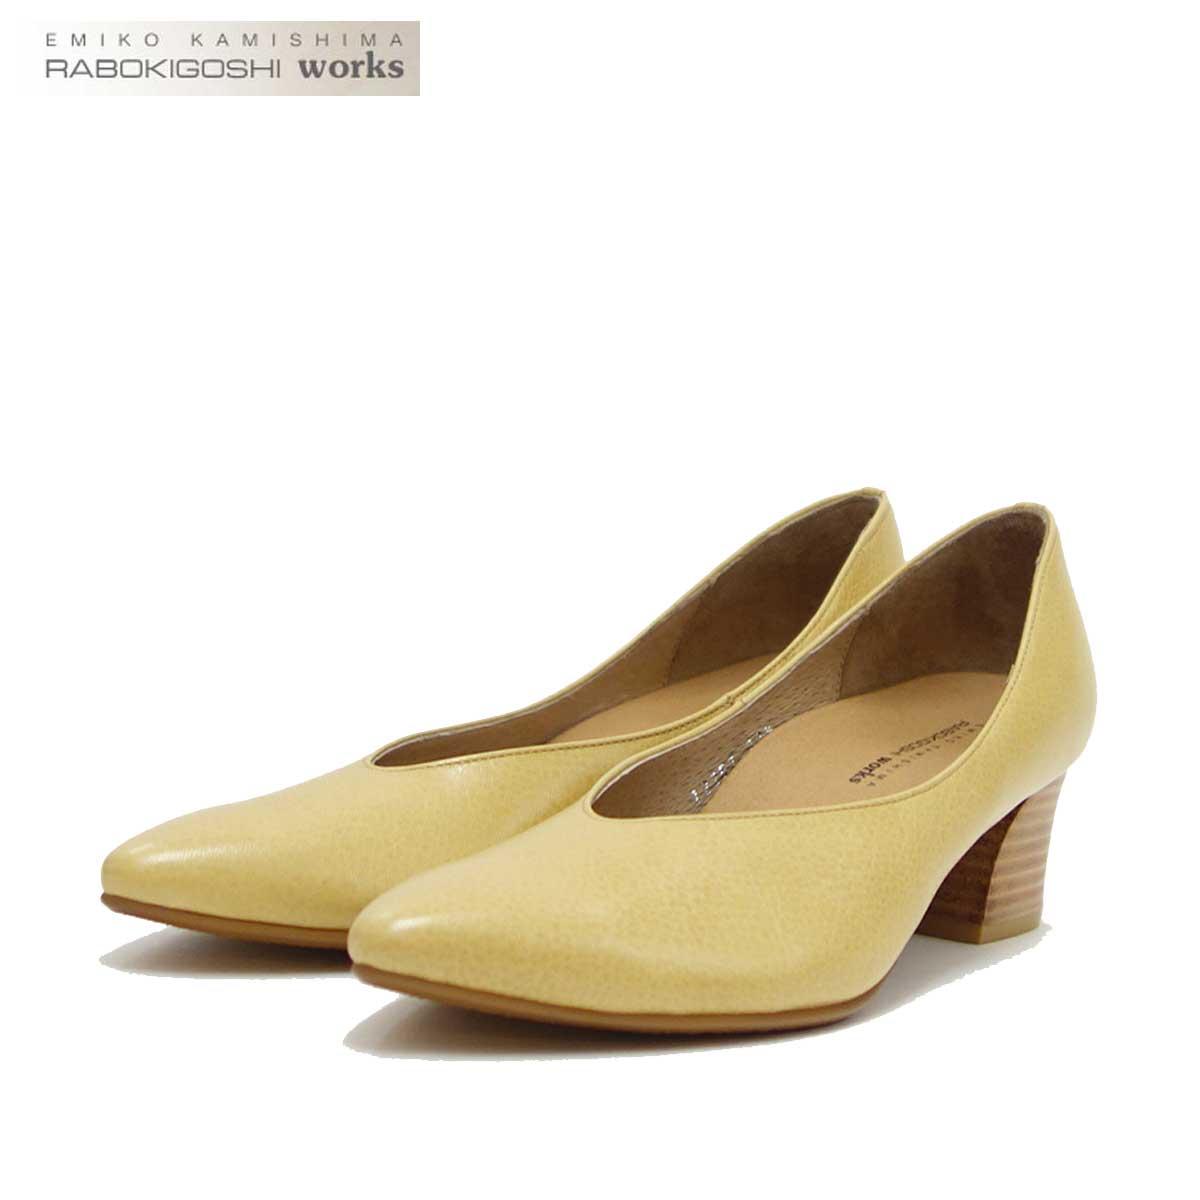 RABOKIGOSHI works(ラボキゴシ ワークス) 12287 ベージュ フットベットプレーンパンプス 「靴」